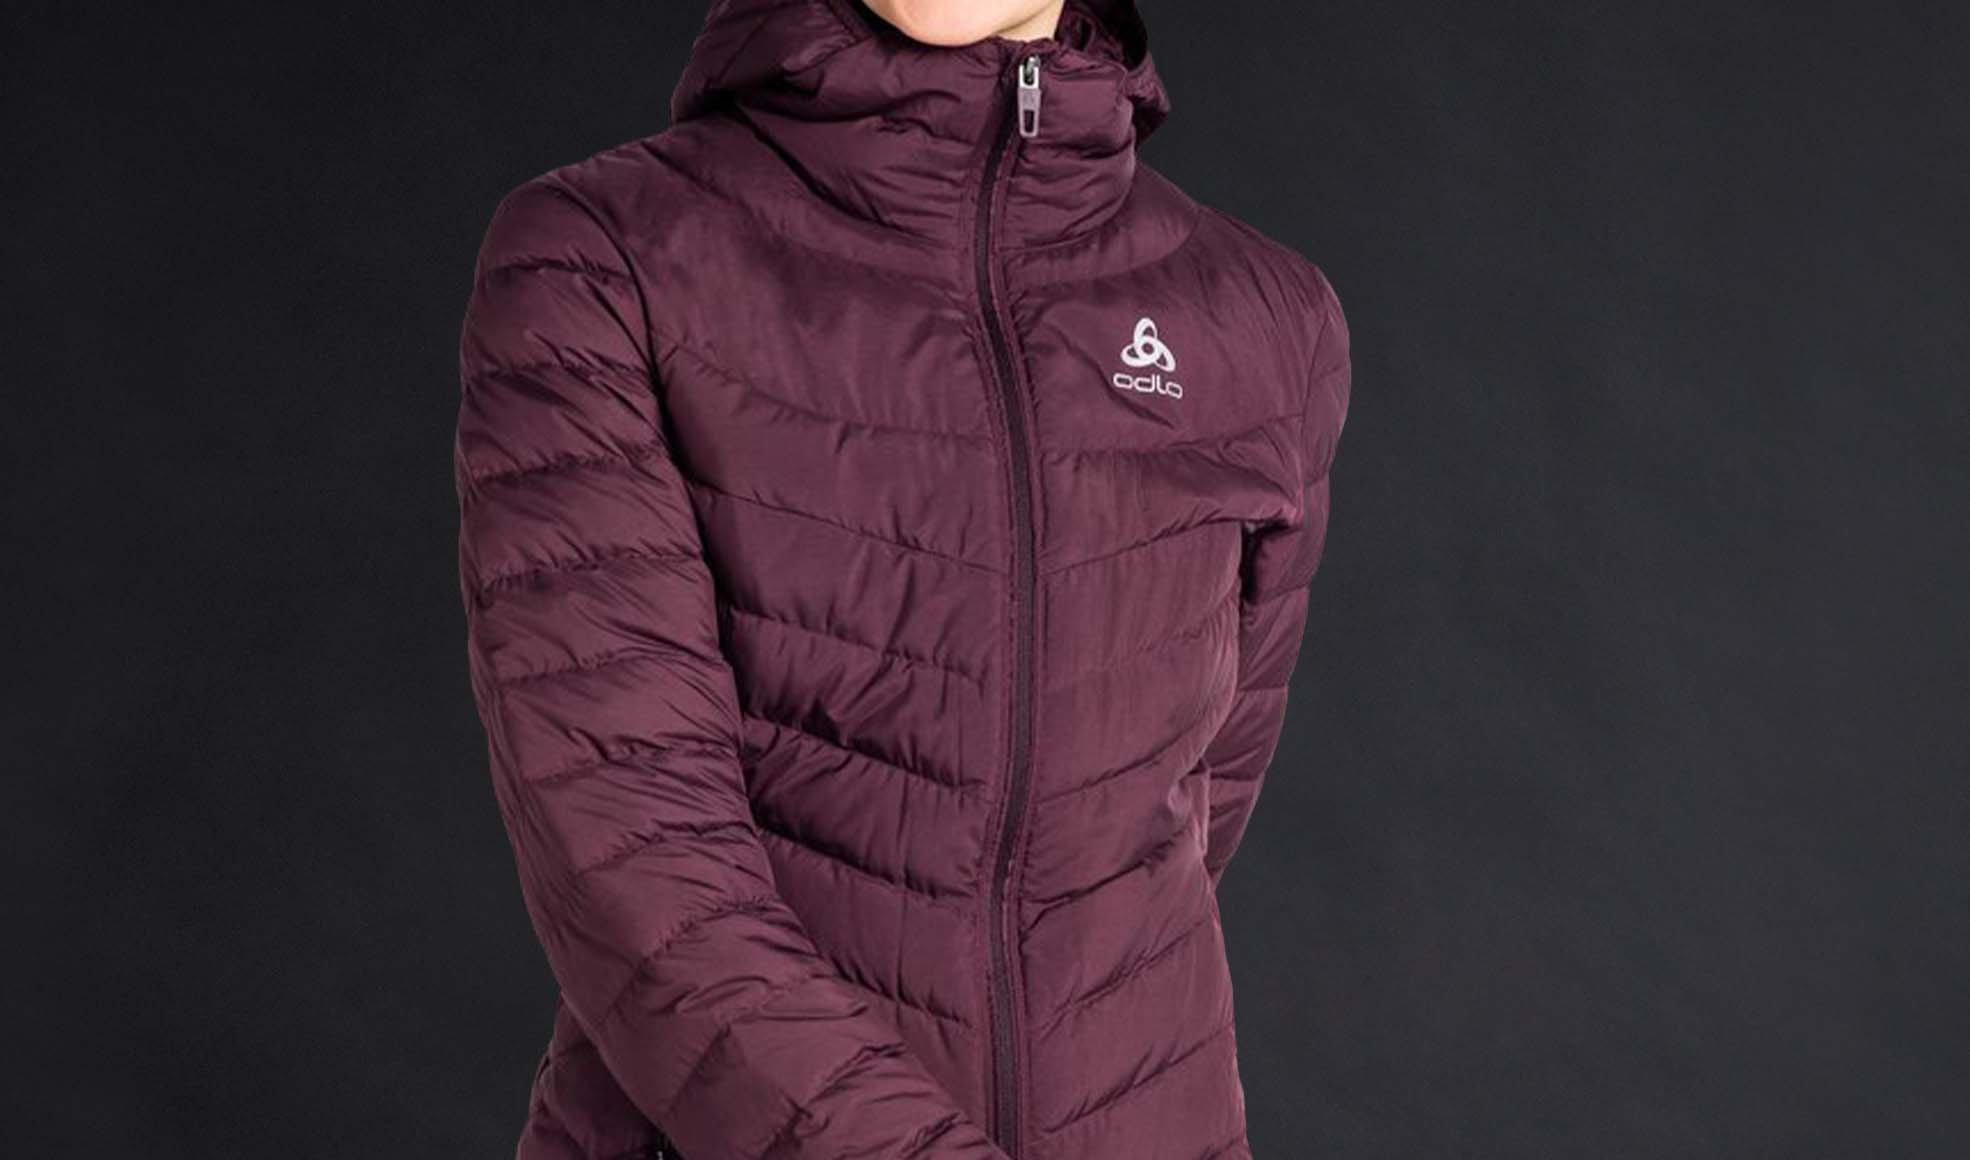 Natural insulation meets lightweight warmth.